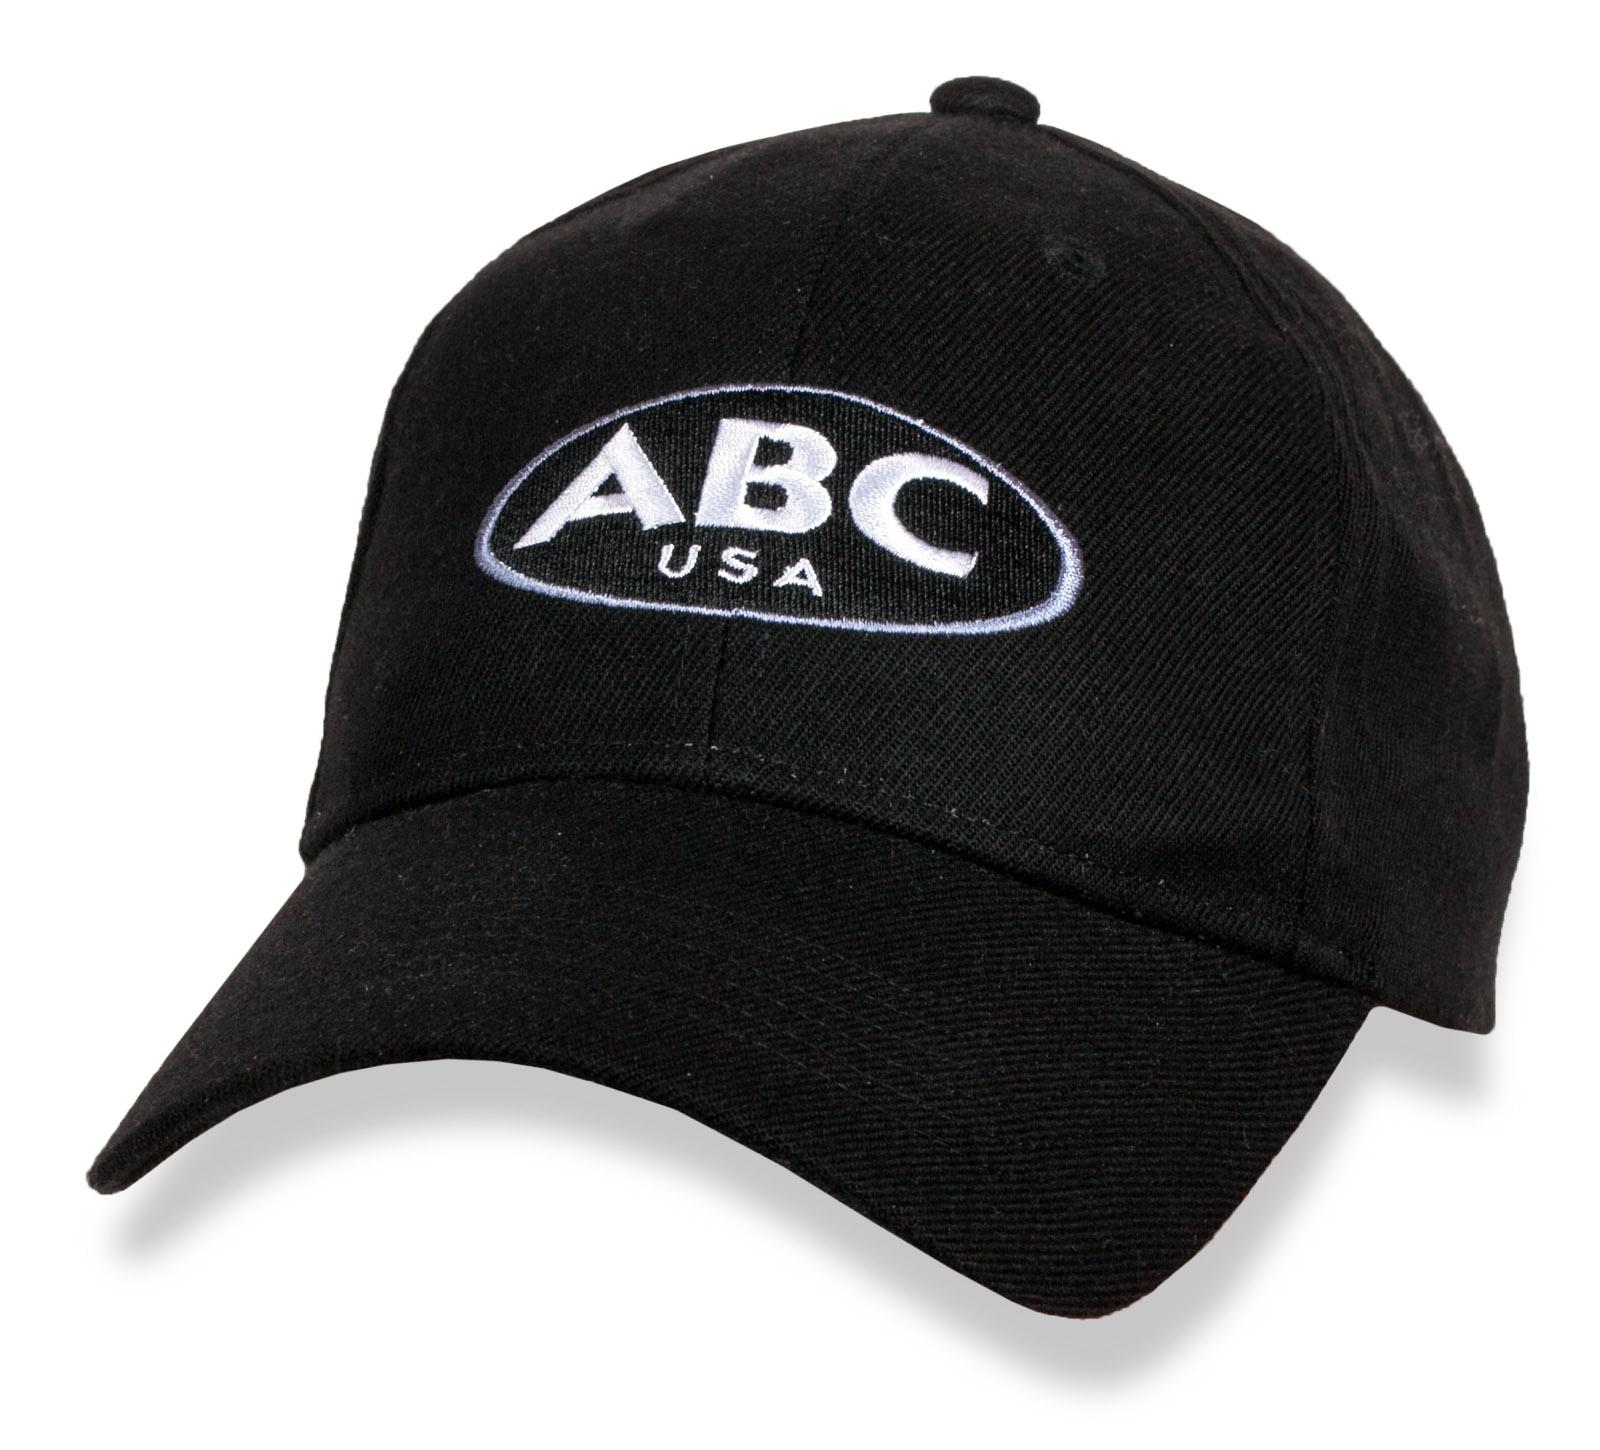 Черная скромная бейсболка ABC